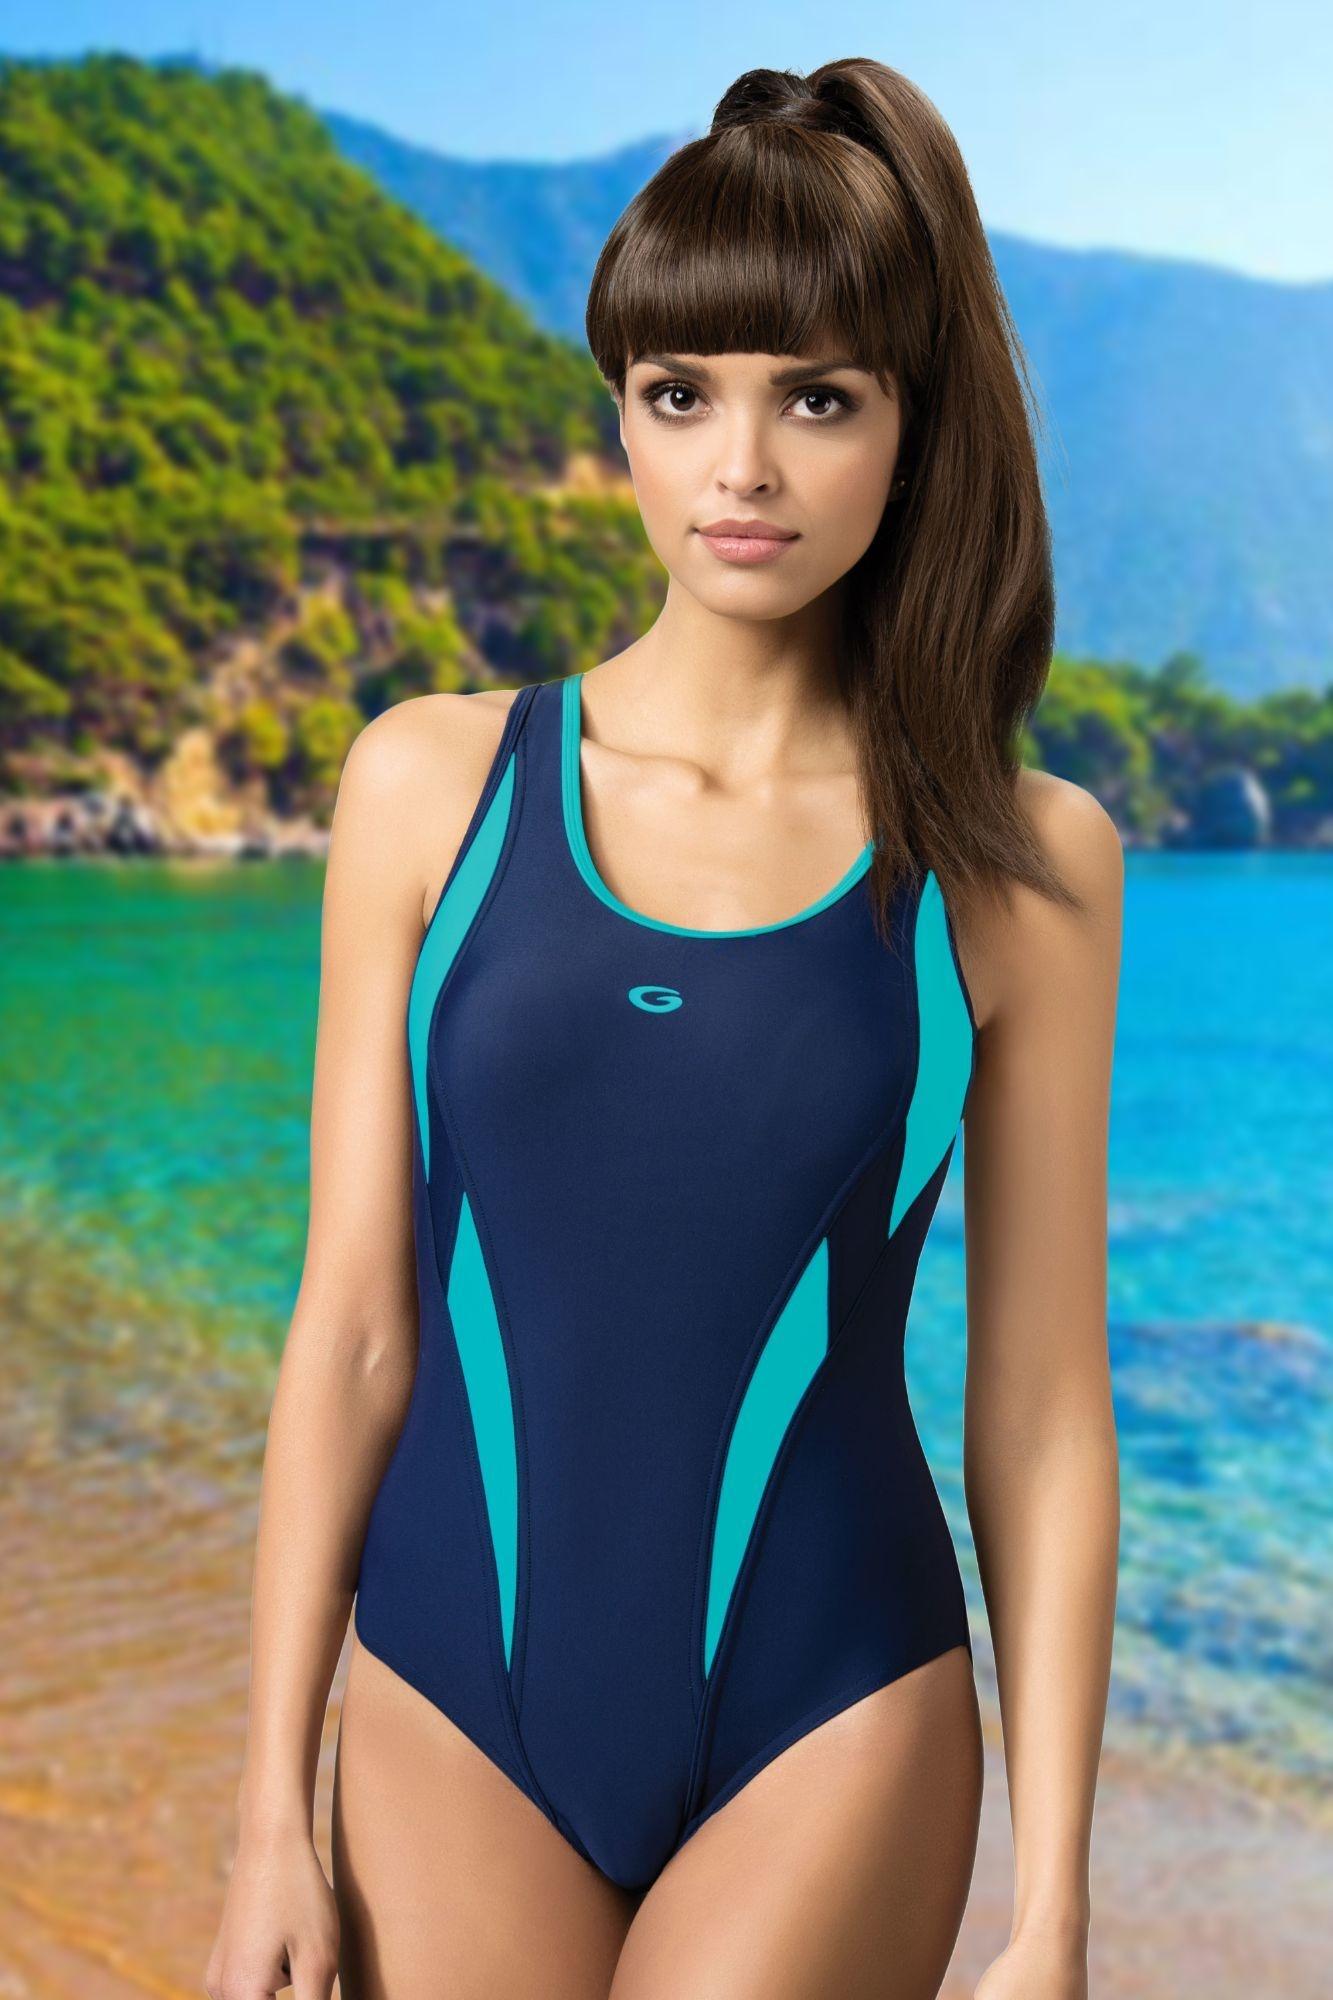 27286d03e Jednodielne športové plavky Aqua III - ELEGANT.sk